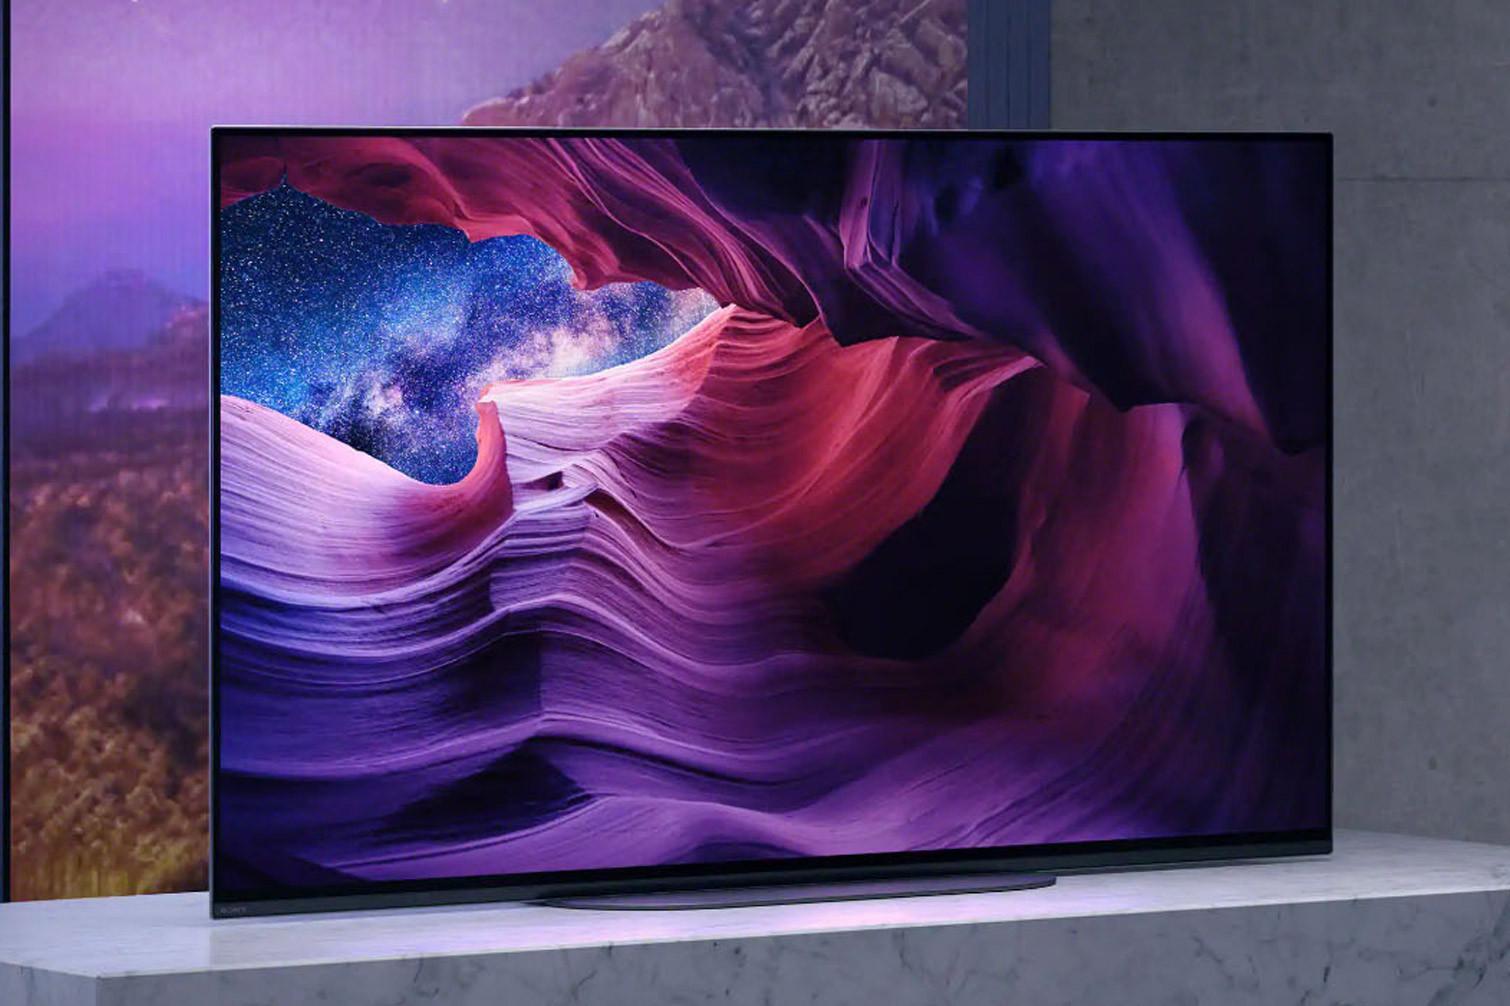 OLED TV 4K 48 inch Sony 48A9S UHD